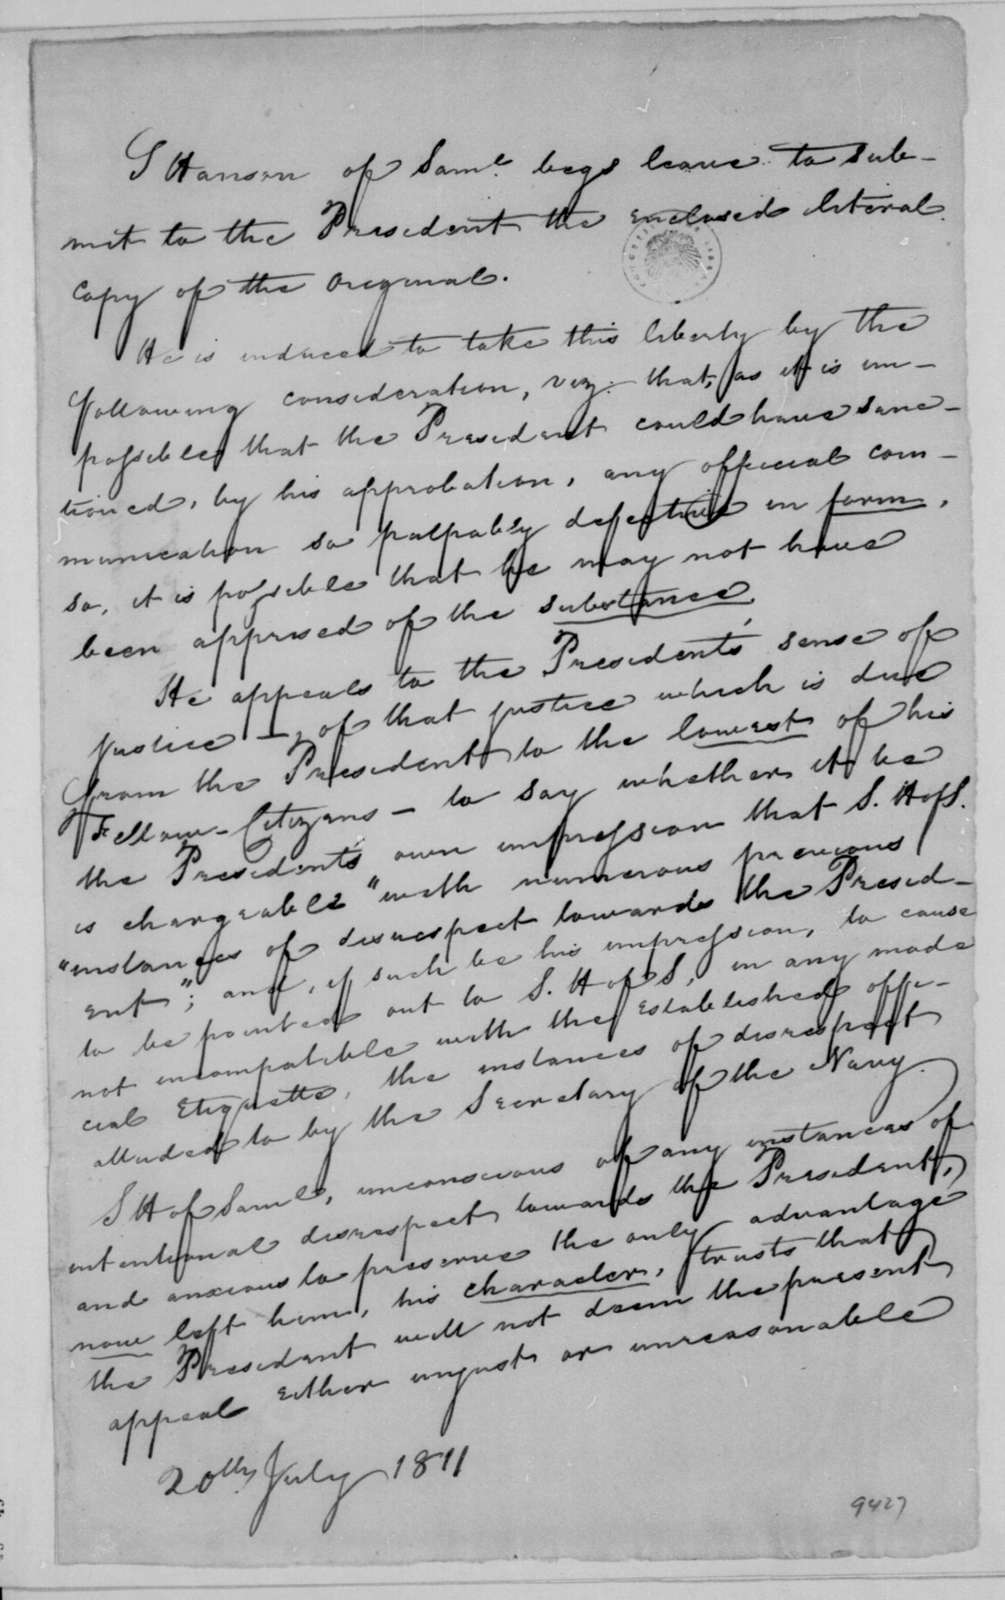 Samuel Hanson of Samuel to James Madison, July 20, 1811.